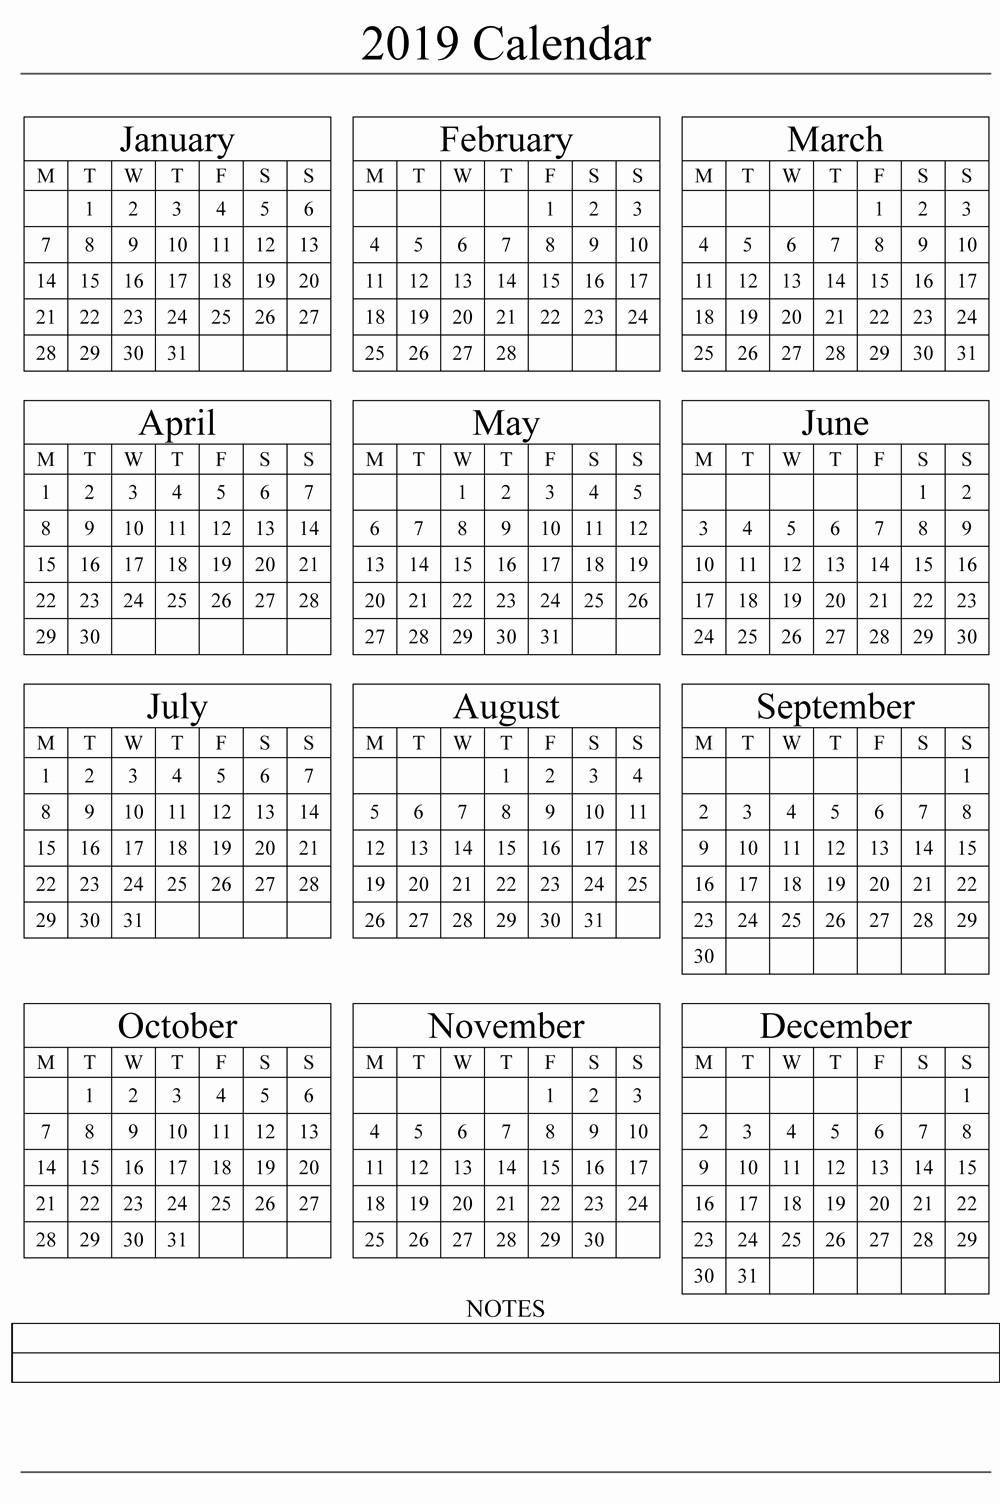 2018 and 2019 Printable Calendar Fresh 2019 Printable Calendar Templates [free]